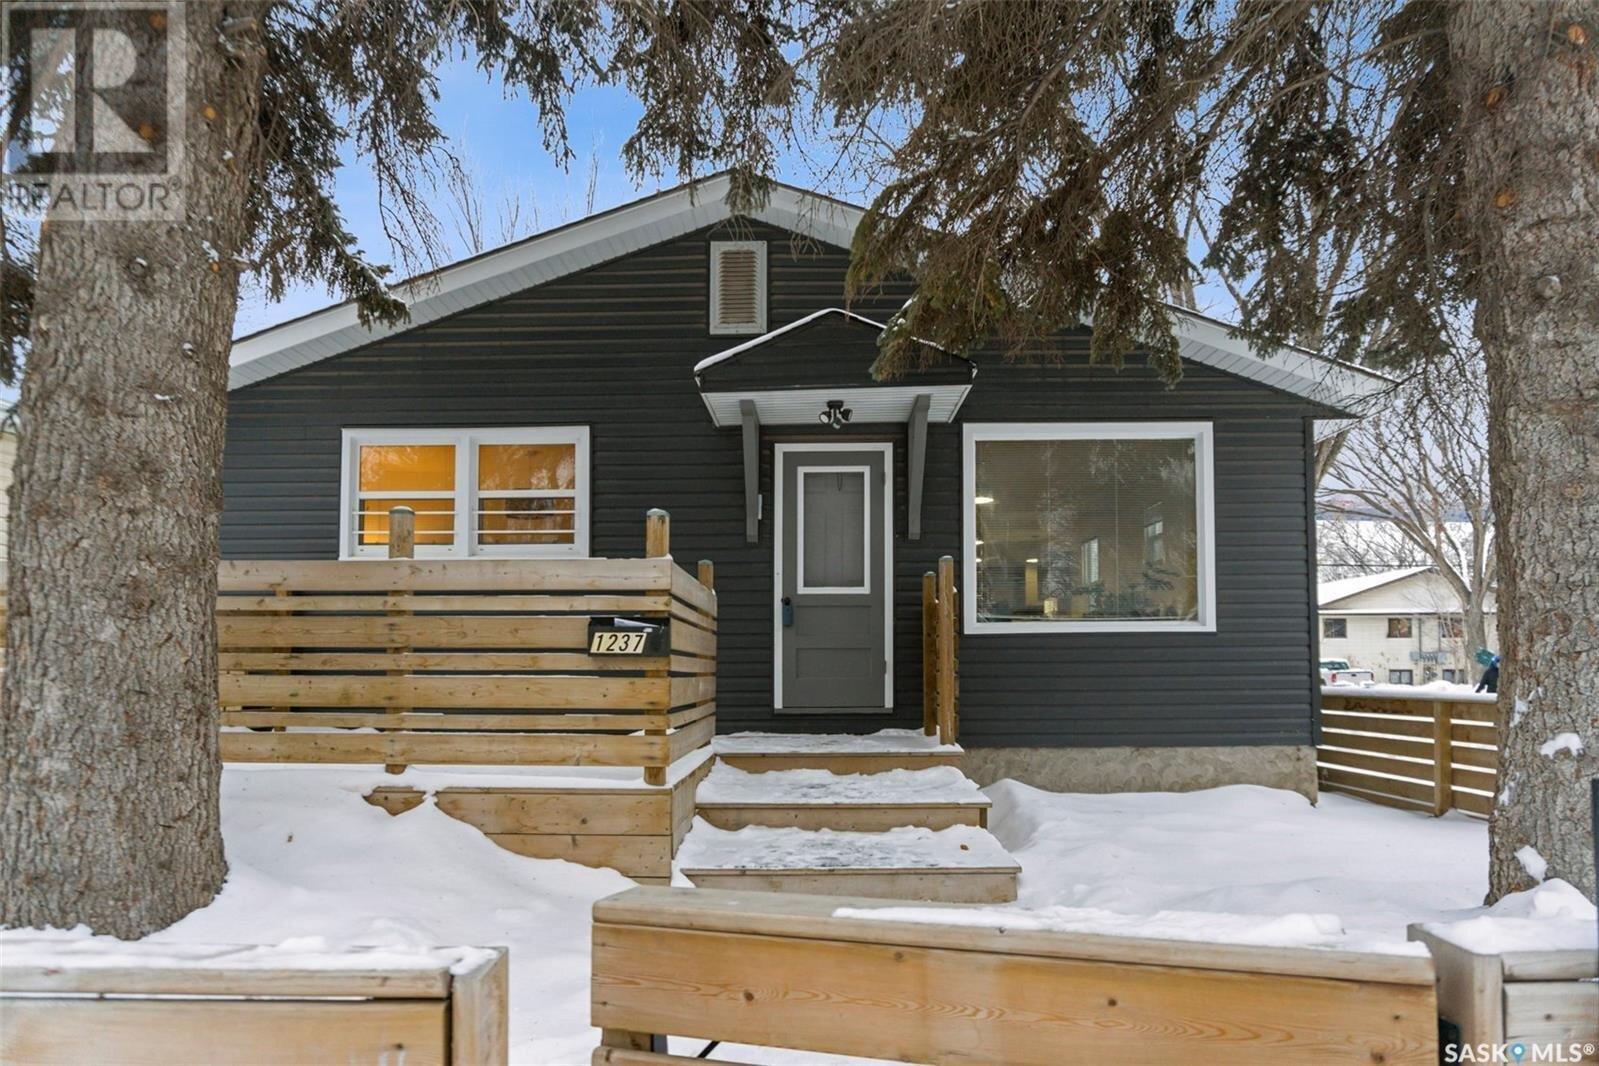 House for sale at 1237 C Ave N Saskatoon Saskatchewan - MLS: SK834335